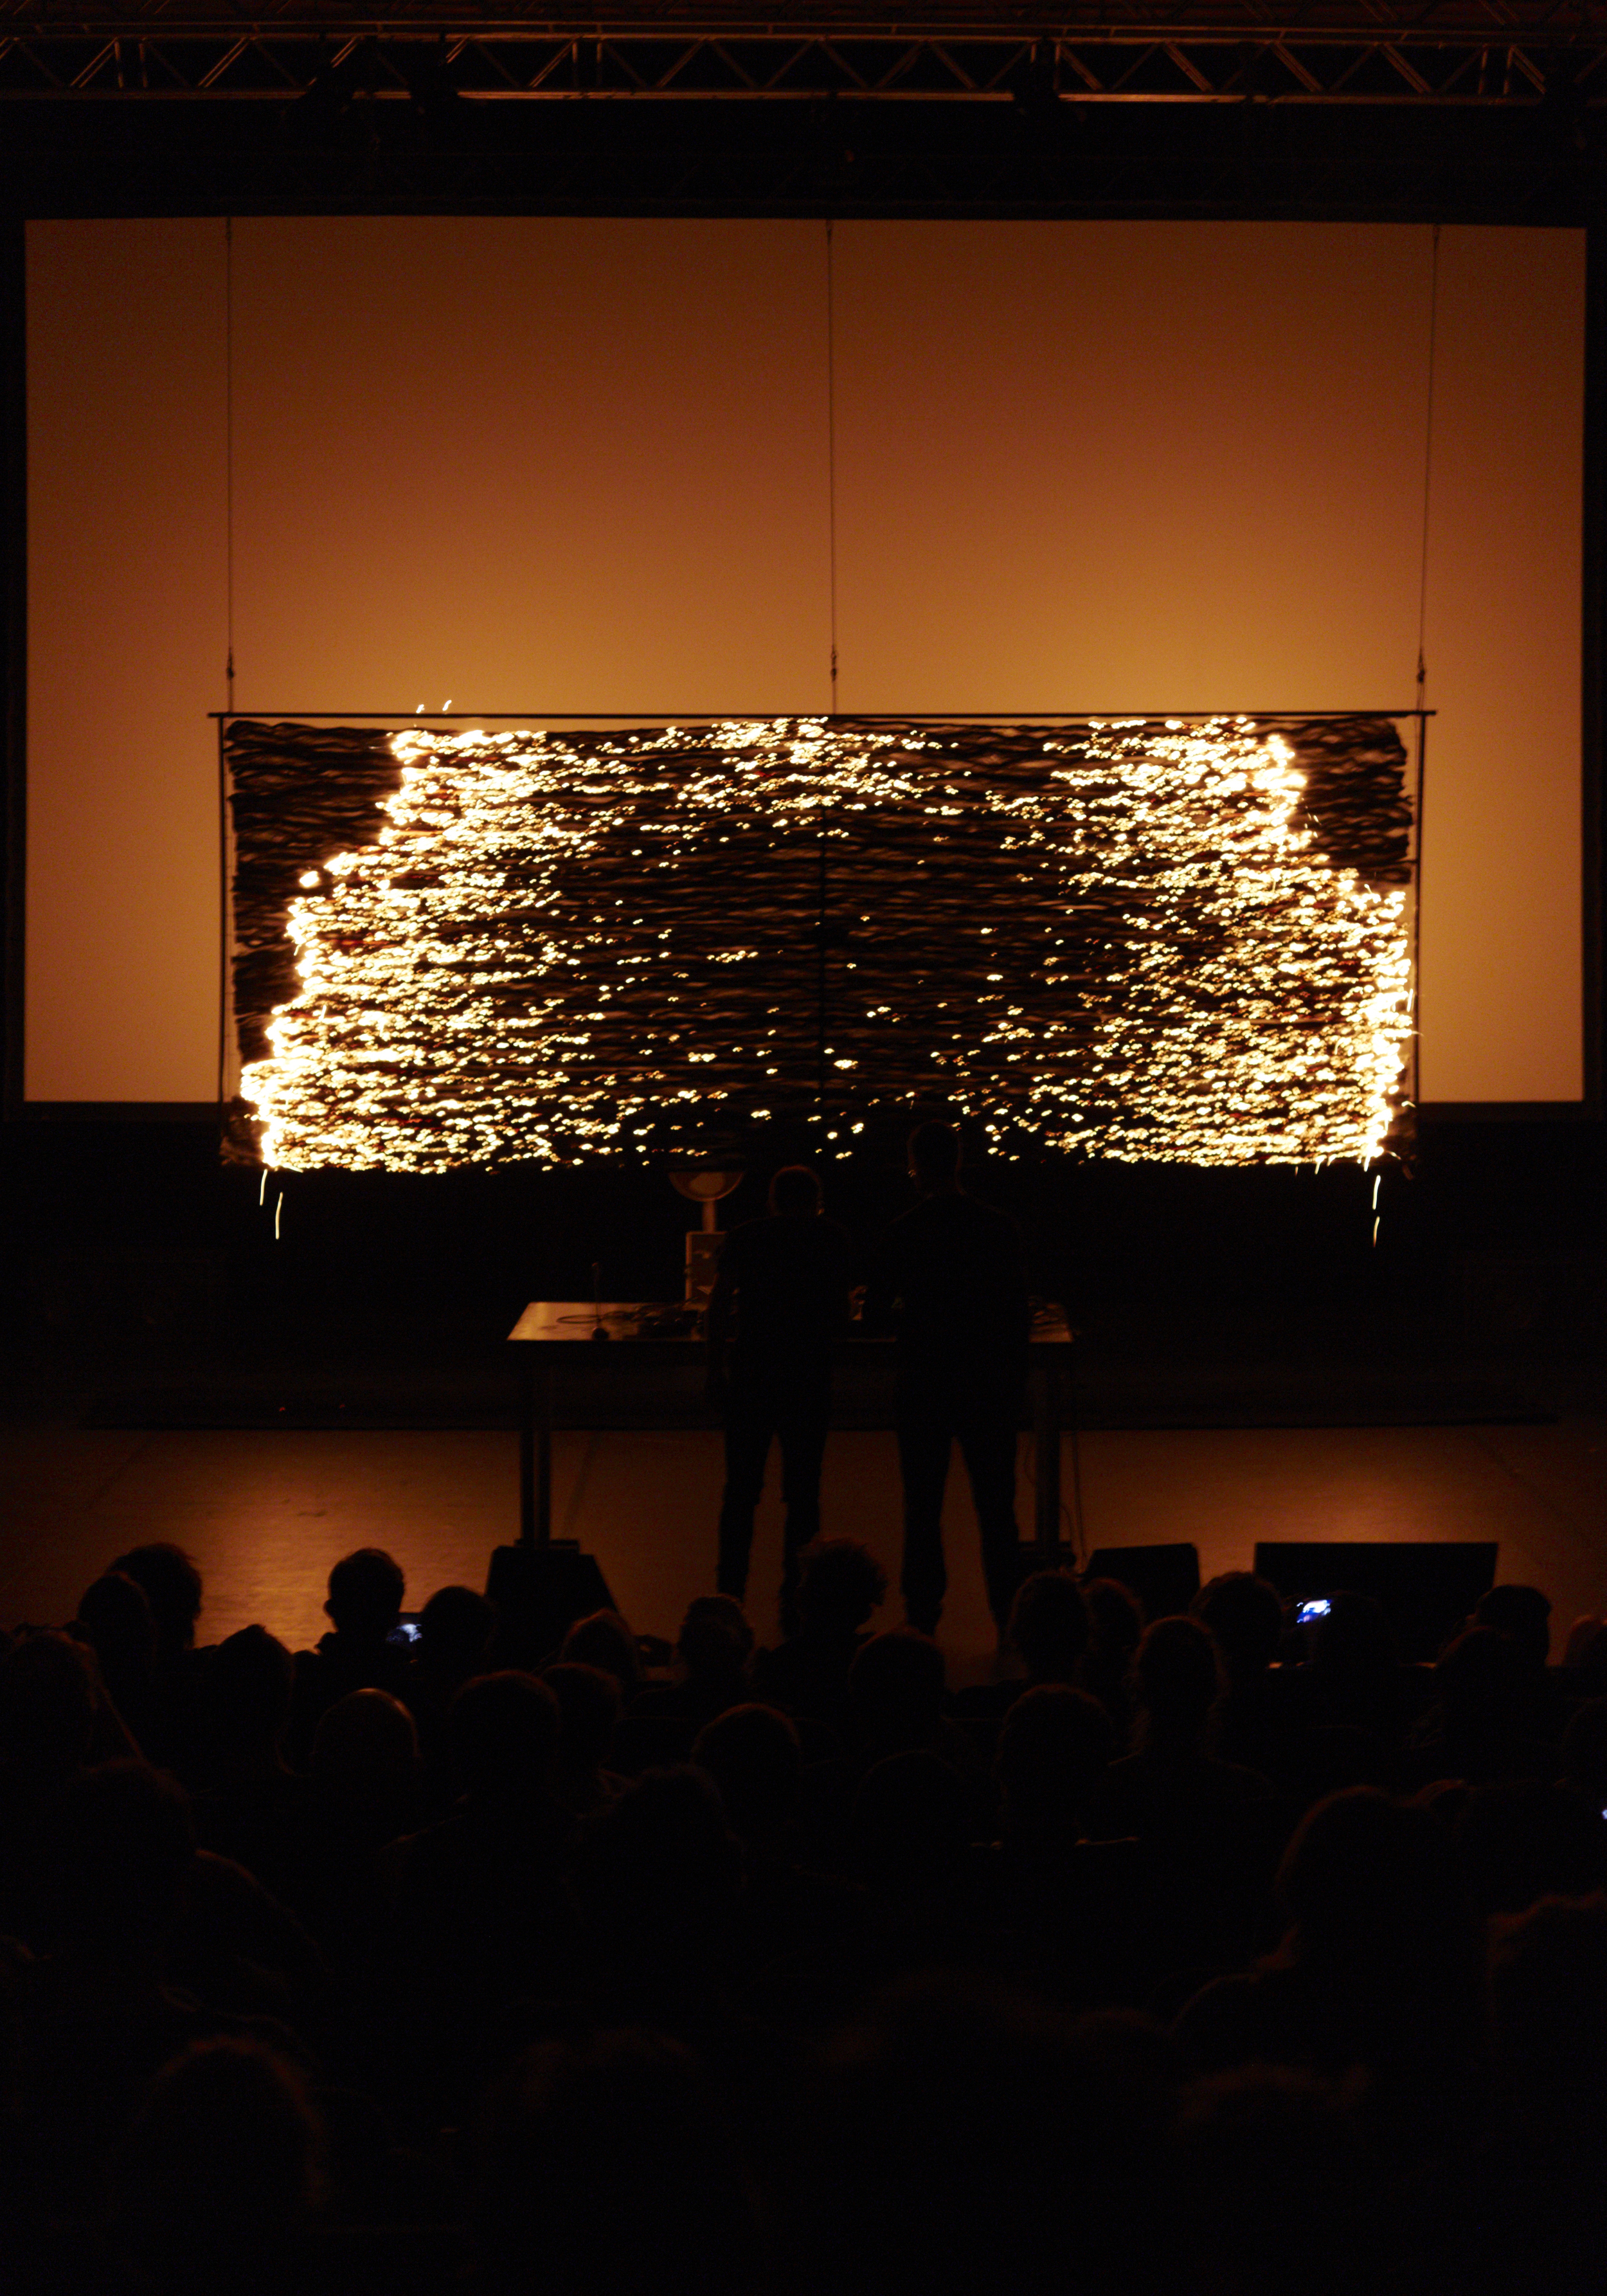 Black Smoking Mirror by Jan-Gert Prins and Martijn van Boven